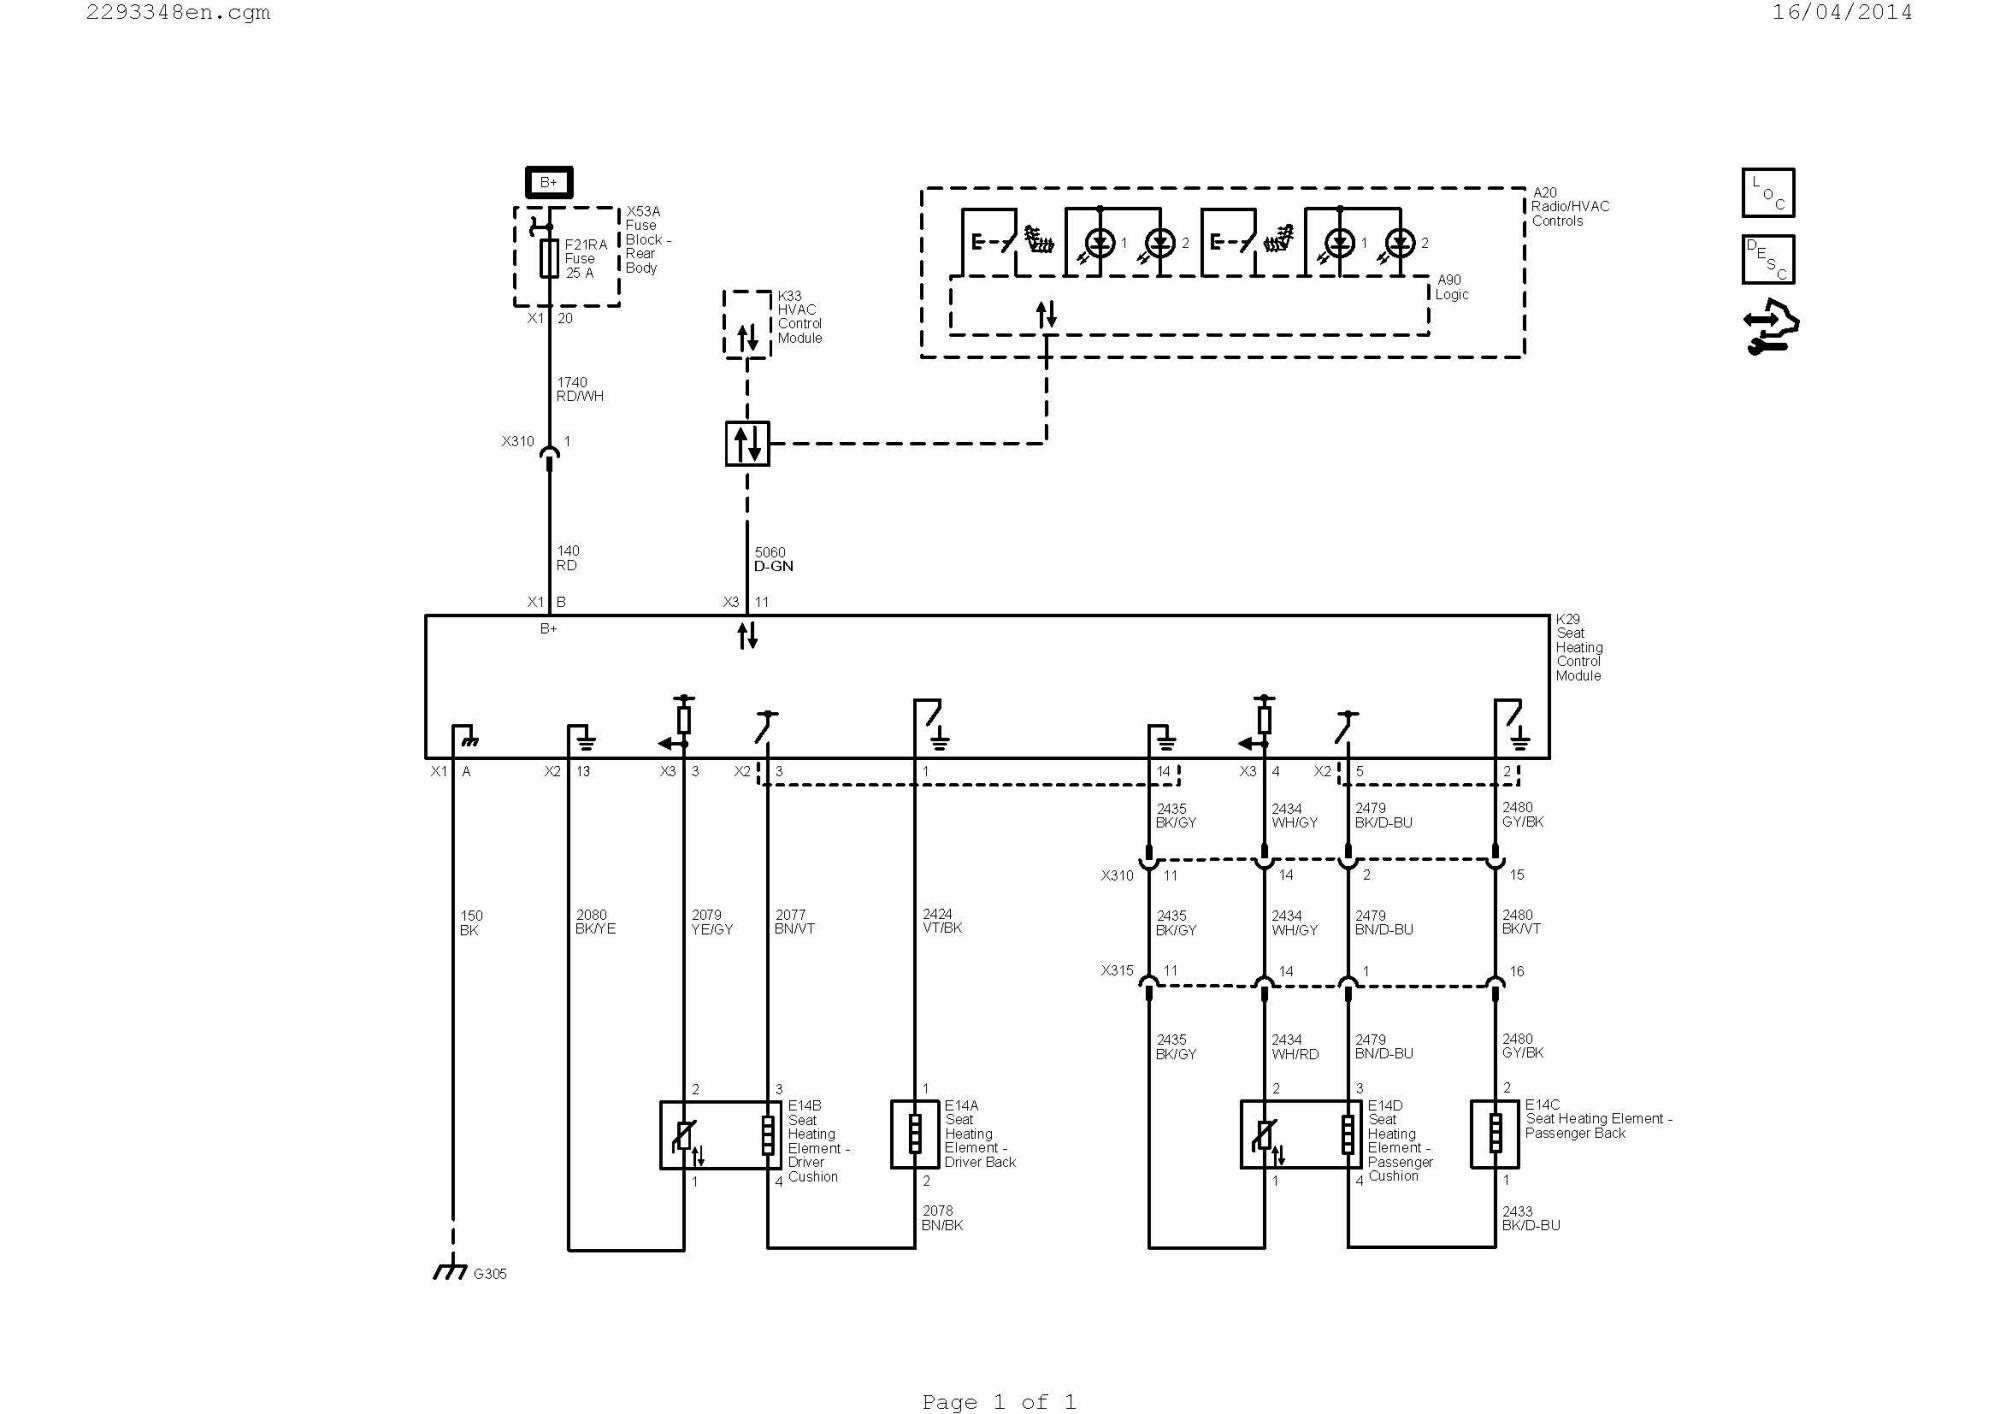 hight resolution of mishimoto fan controller wiring diagram furnace wiring diagram download furnace parts diagram new hvac diagram